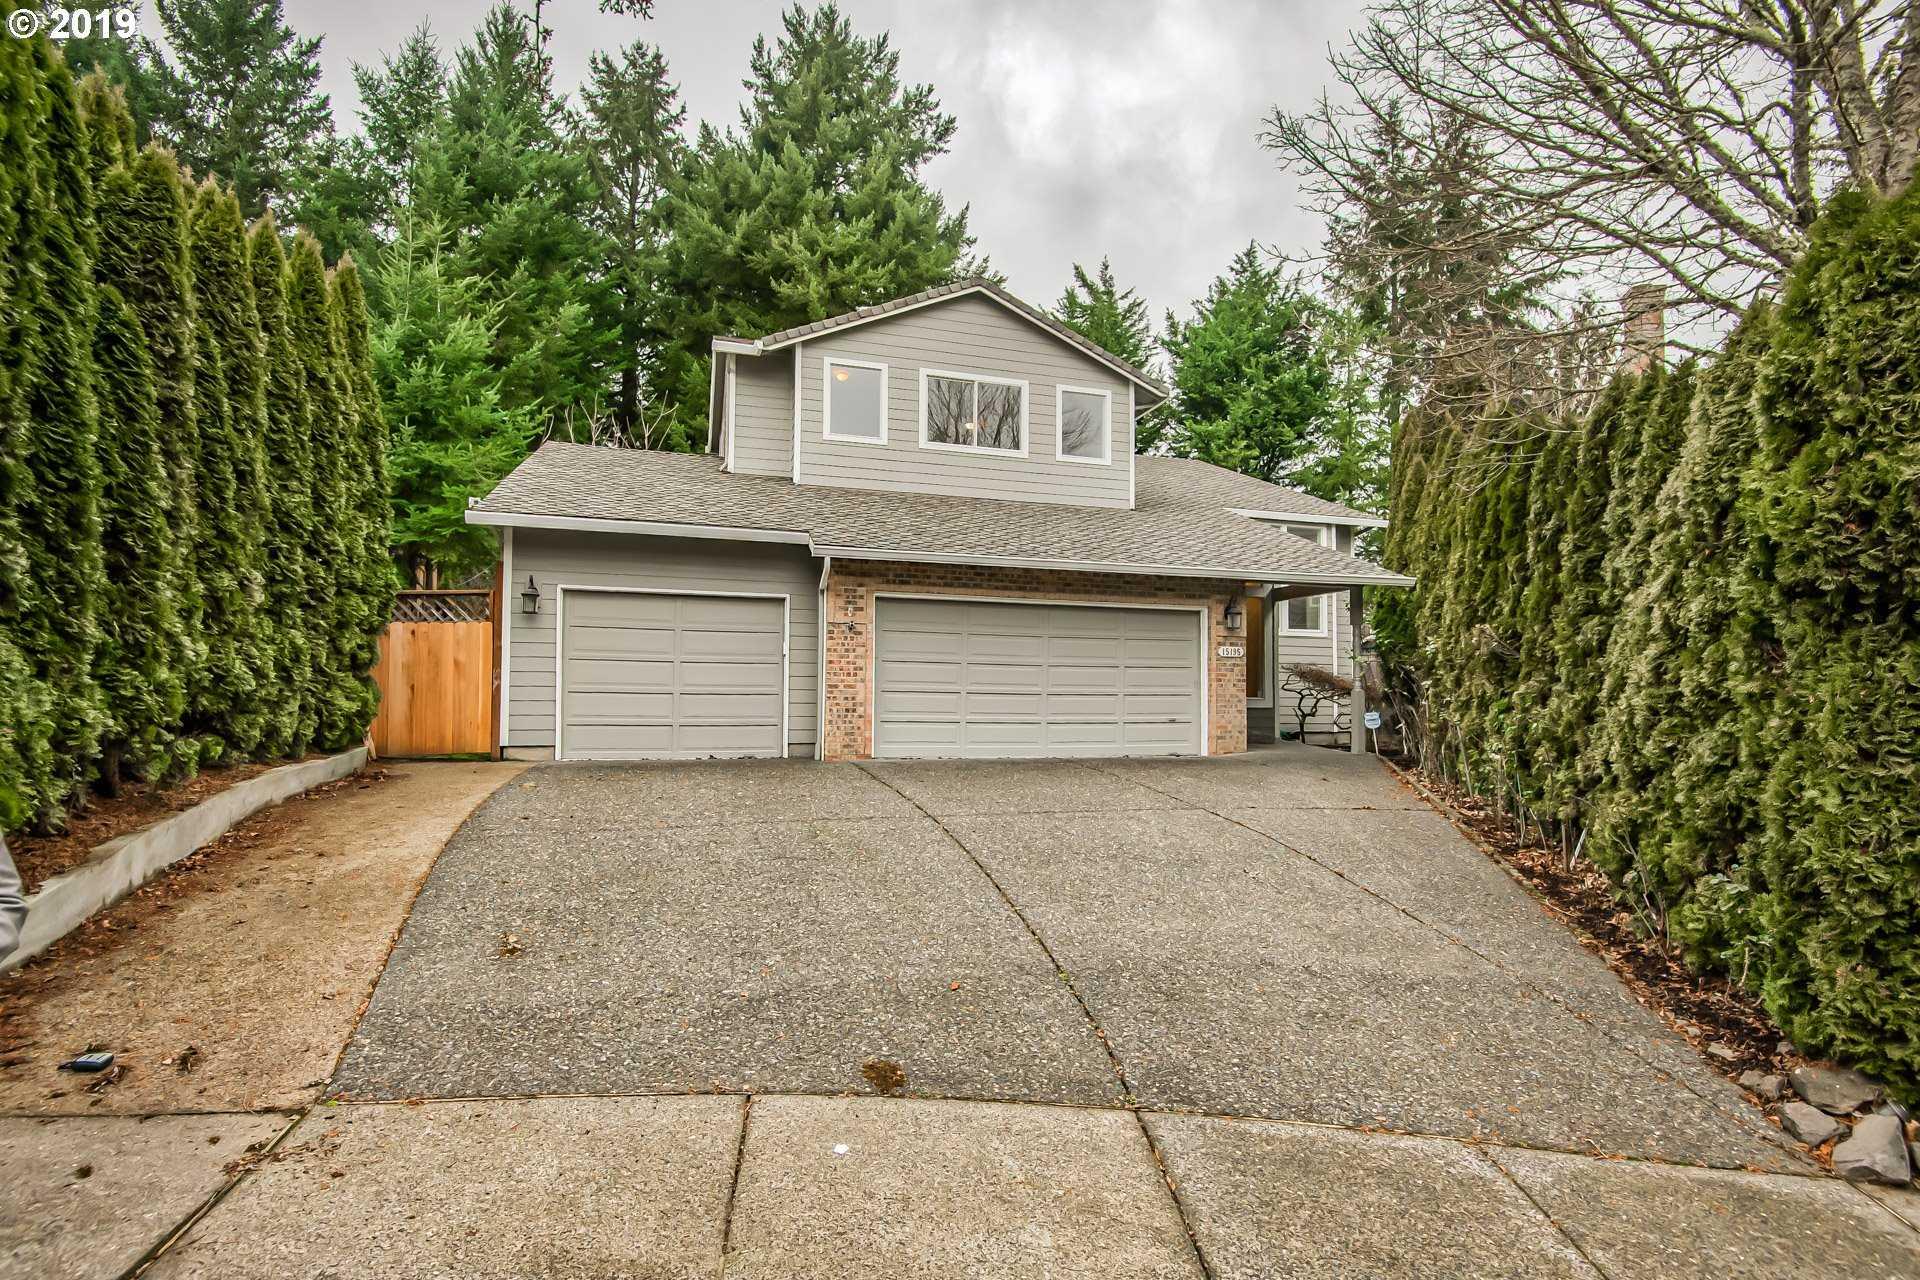 $519,000 - 4Br/3Ba -  for Sale in Beaverton